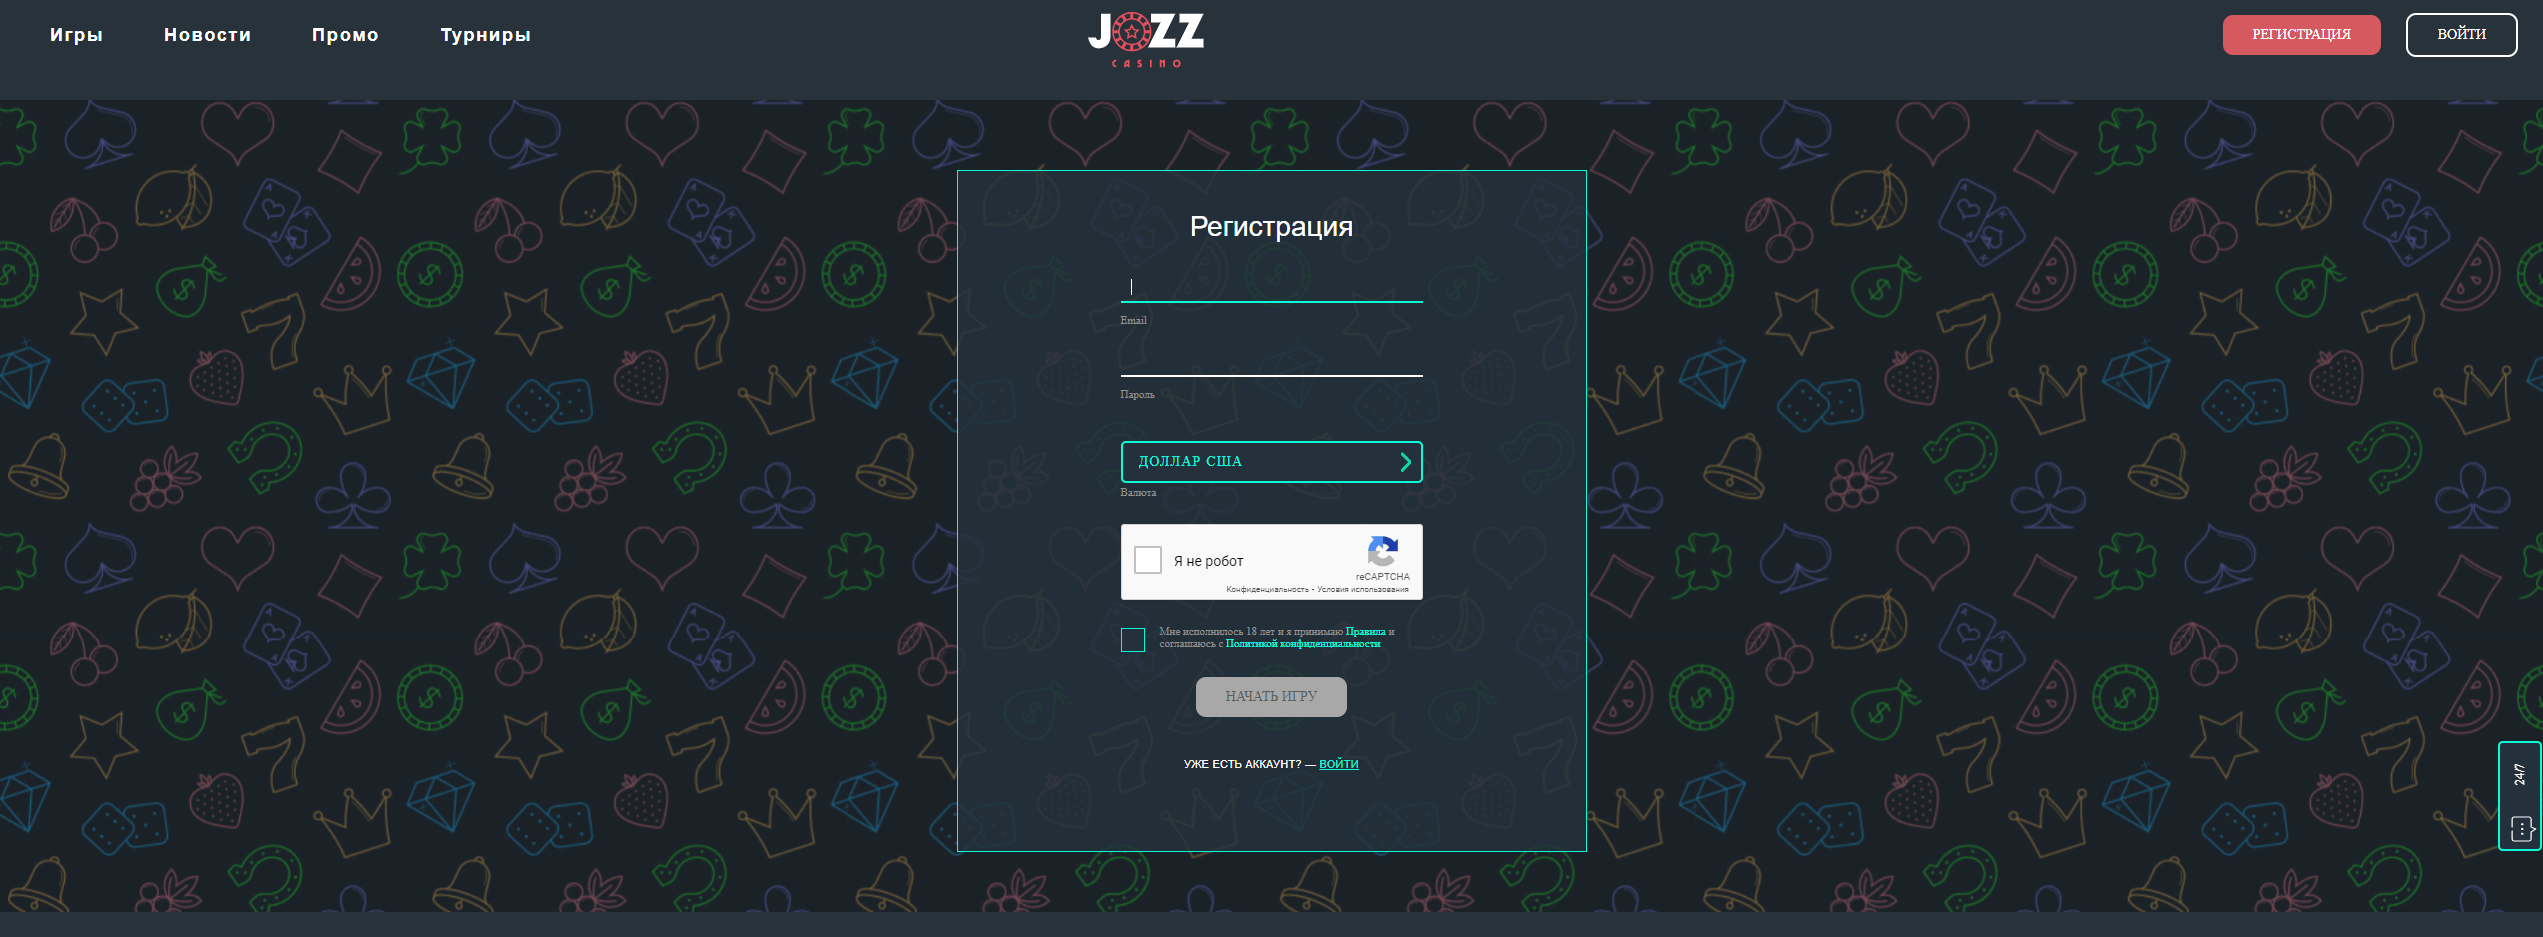 jozz casino регистрация на сайте